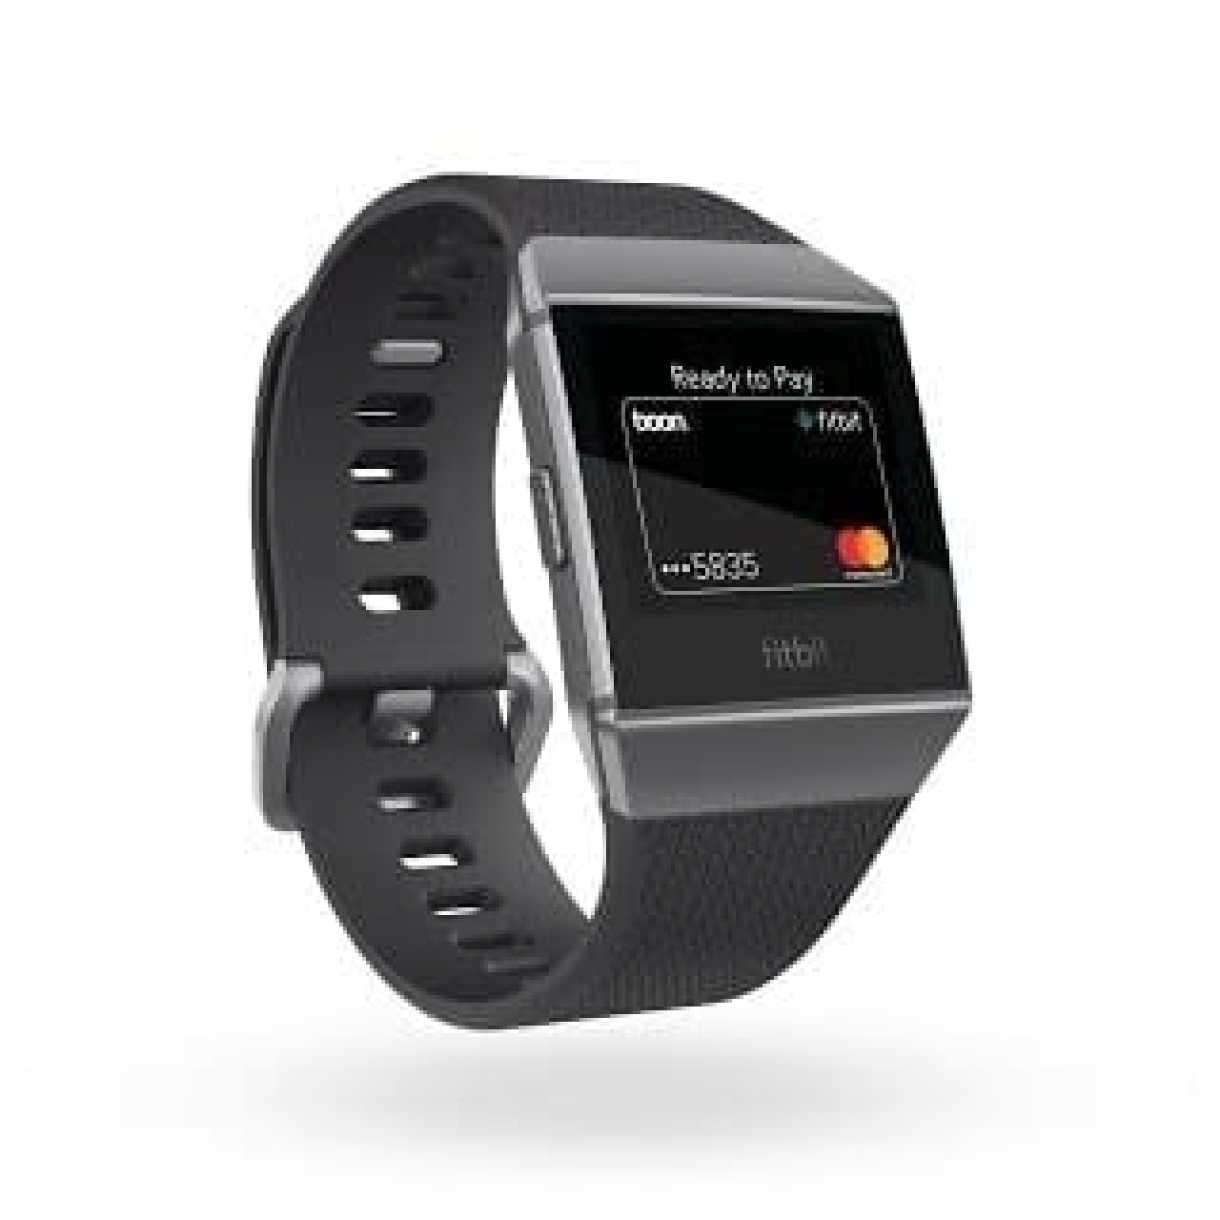 - FitbitVISUALASSET 1 - Mastercard จับมือ Fitbit เปิดตัว 'Fitbit Pay' เพื่อการจับจ่ายที่สะดวกและมั่นใจ